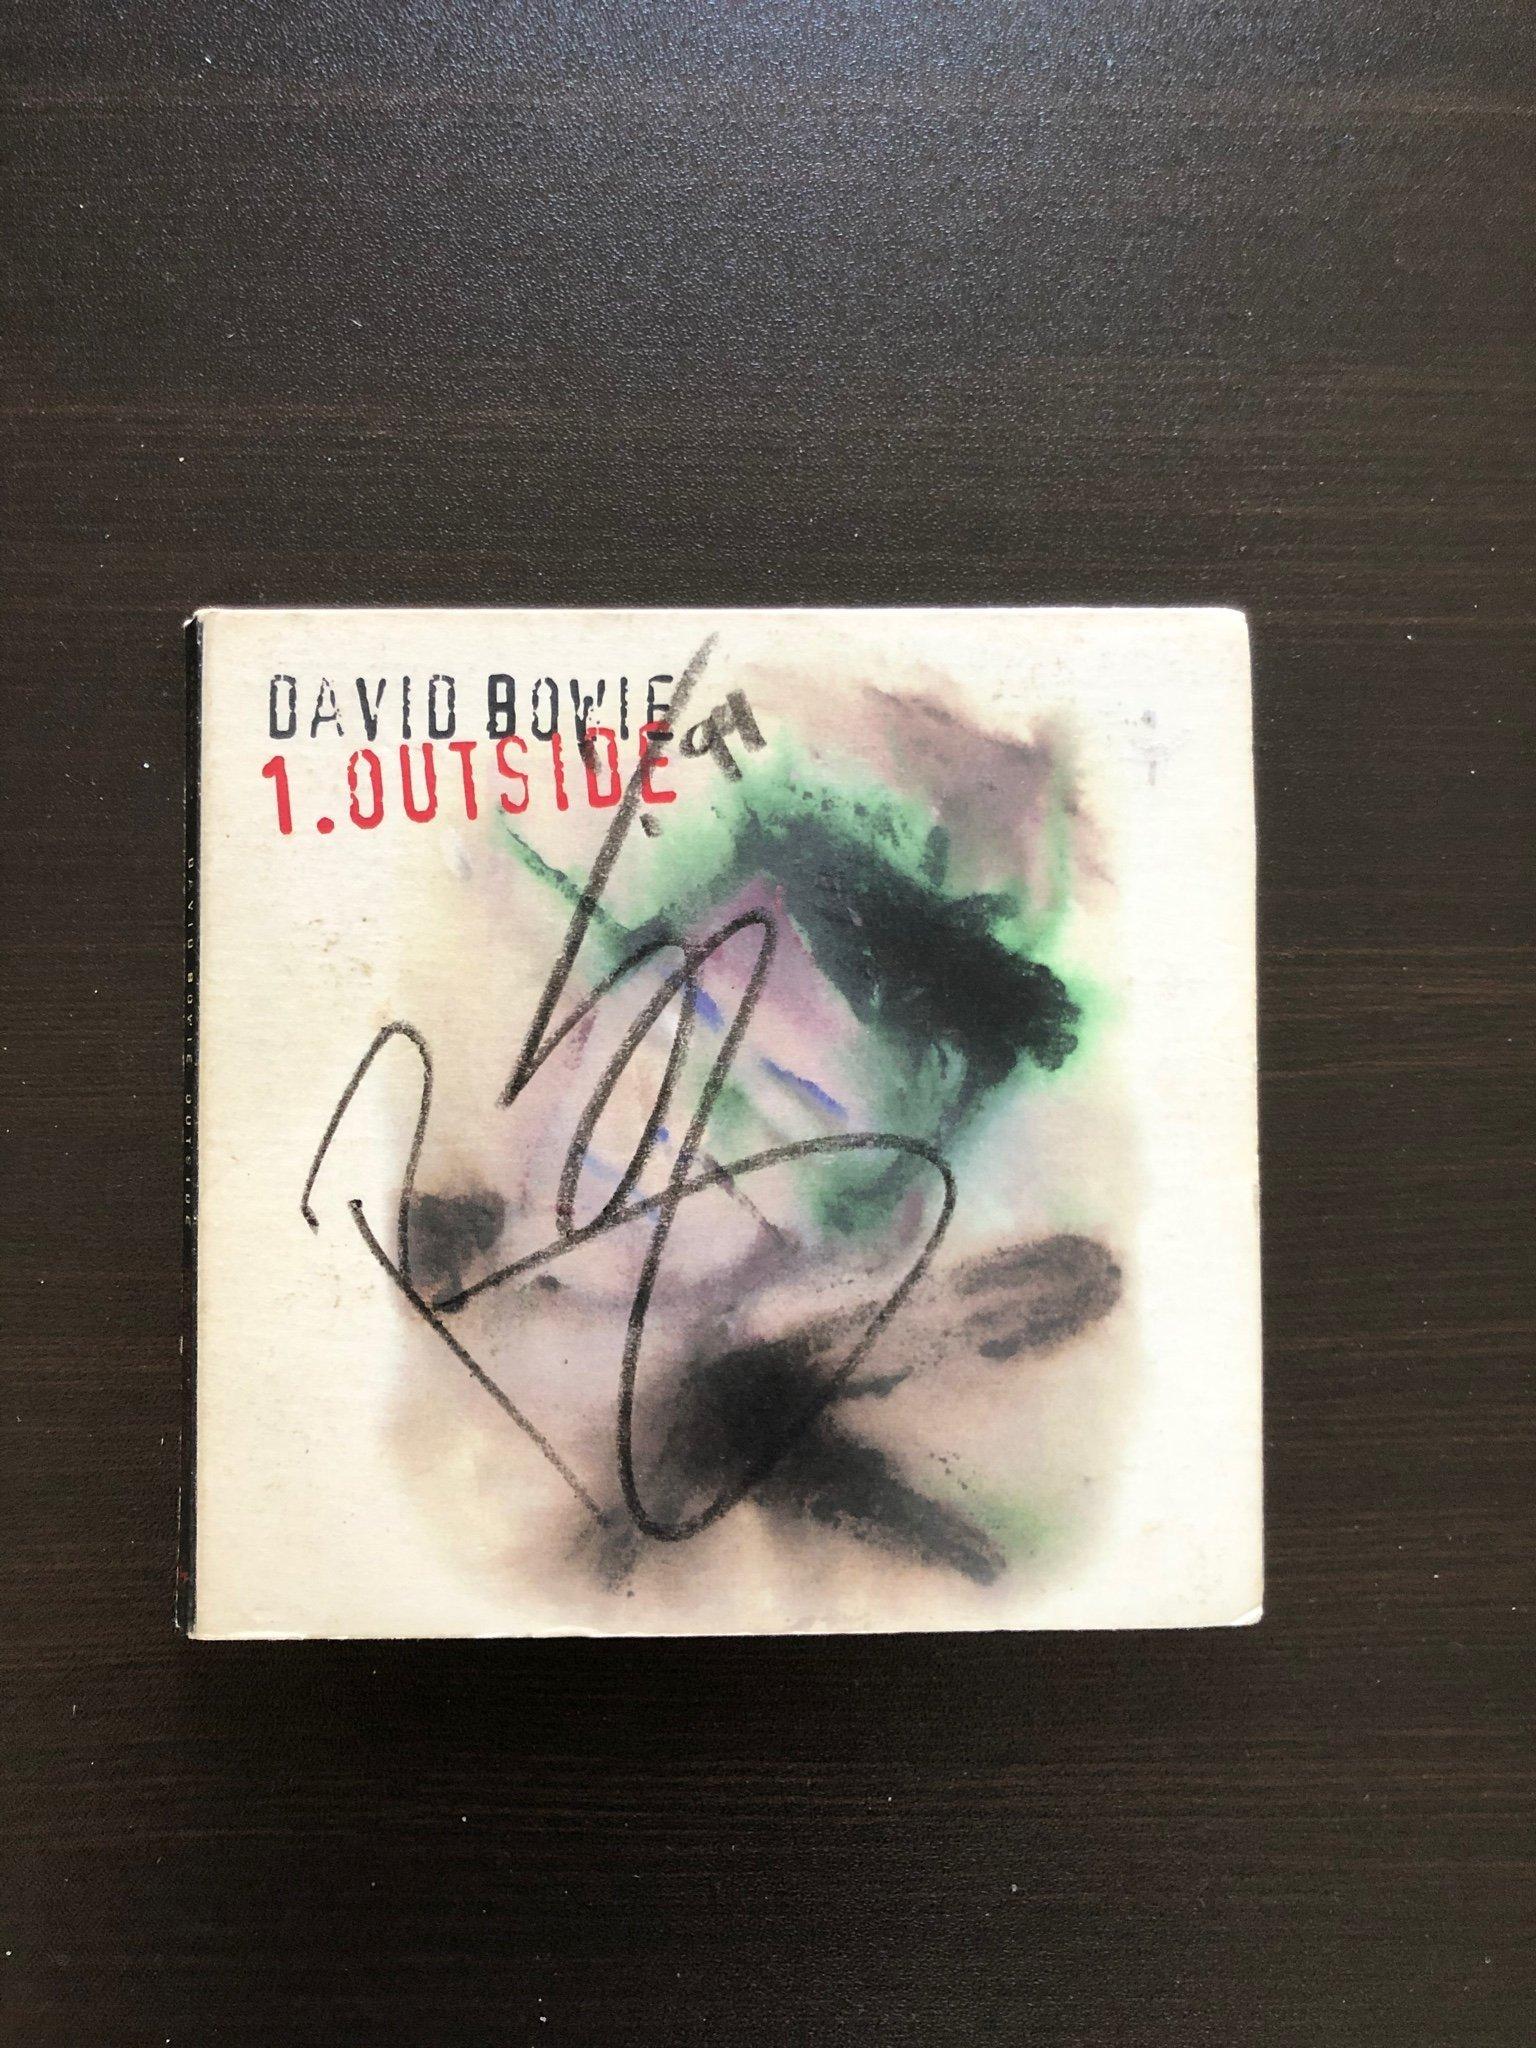 David Bowie - Outside (Endast fodral ,cd skivan fattas) Signerad